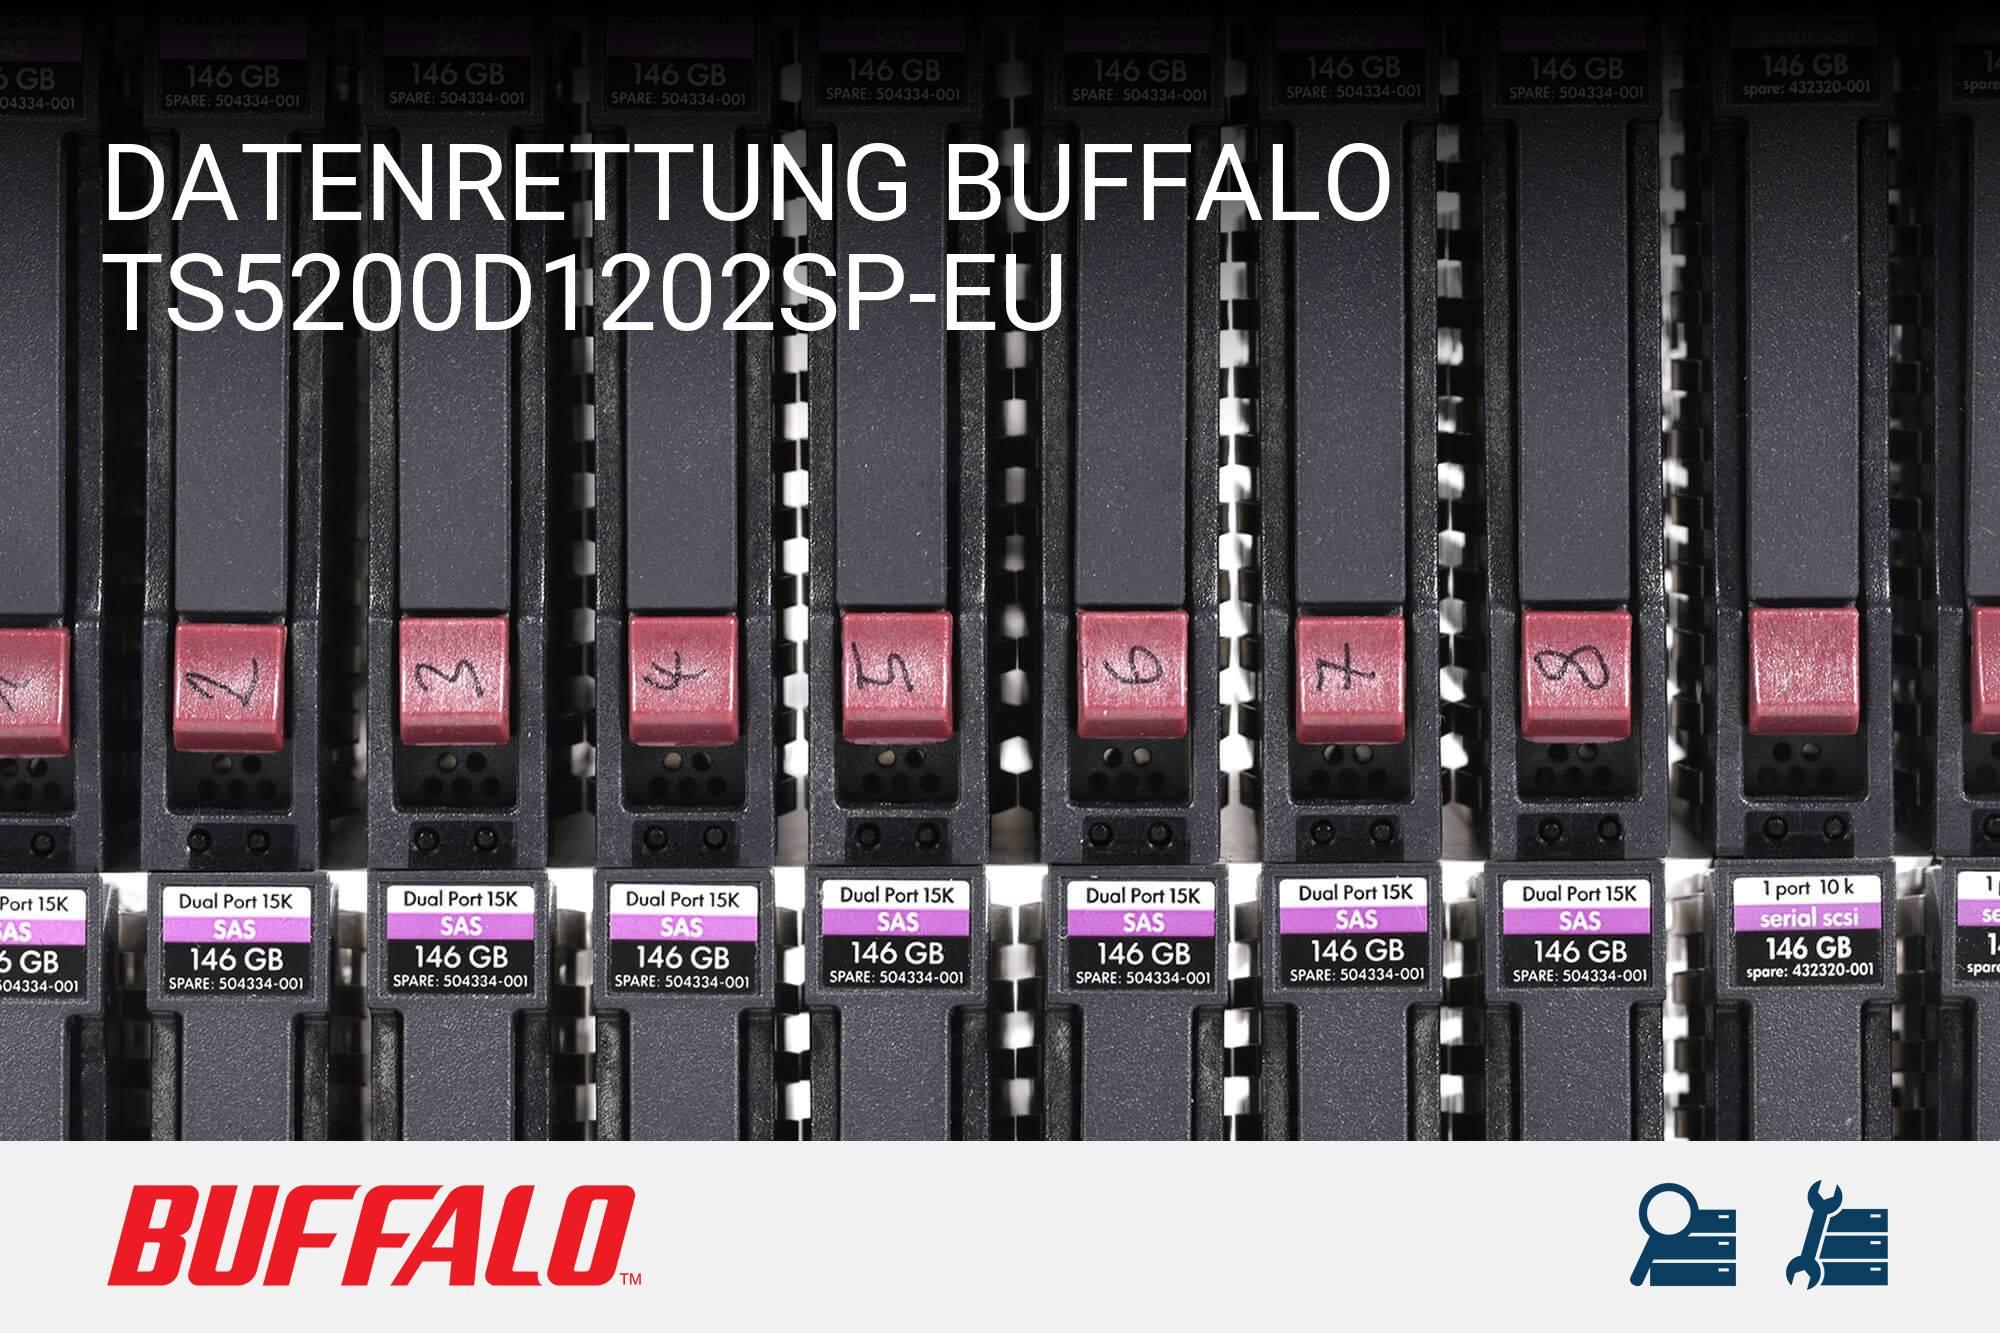 Buffalo TS5200D1202SP-EU